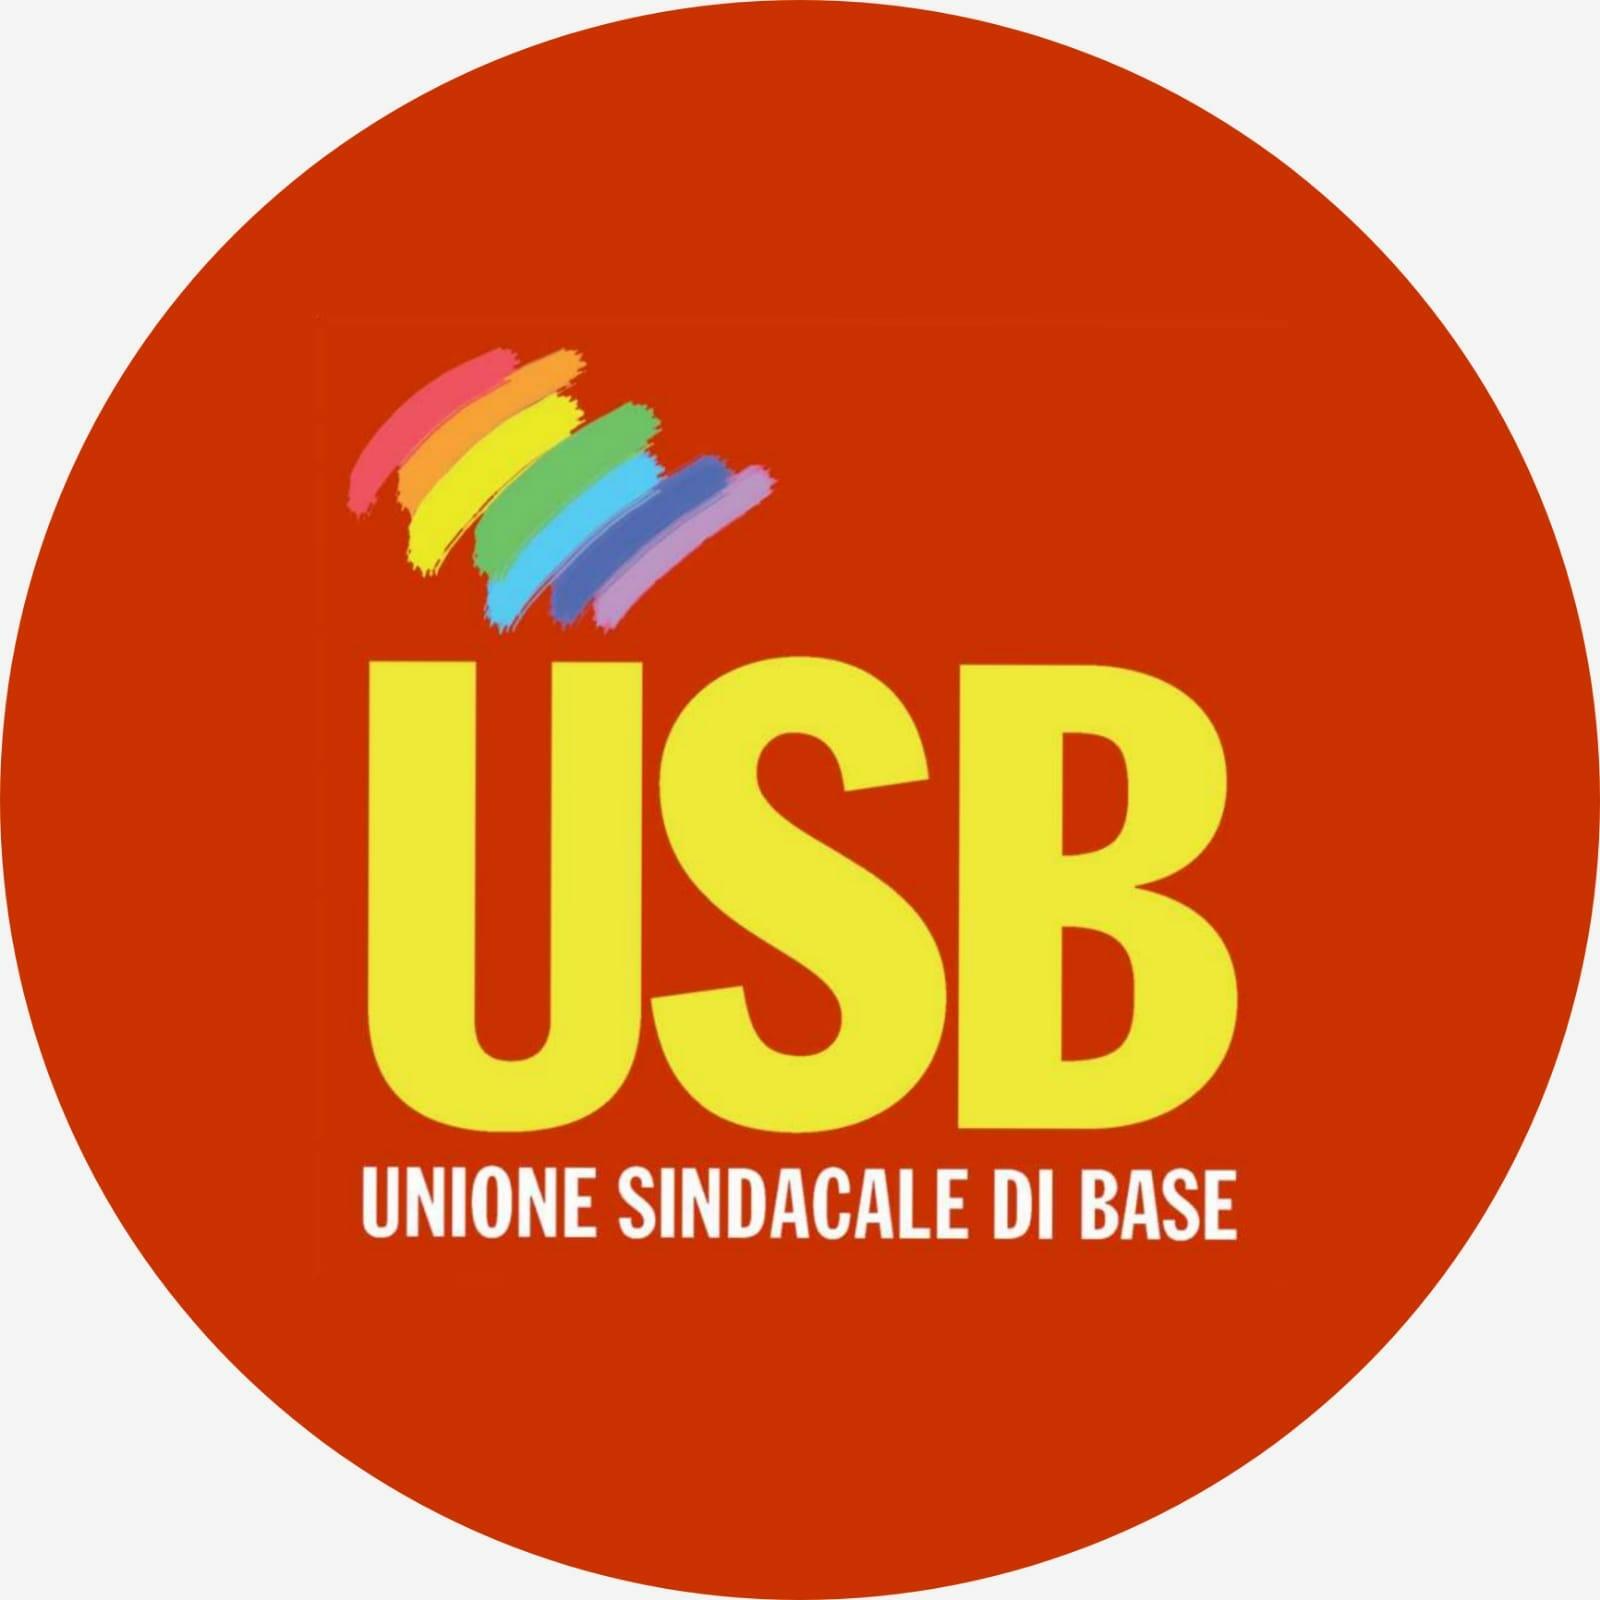 Unione Sindacale Di Base www.ultimavoce.it